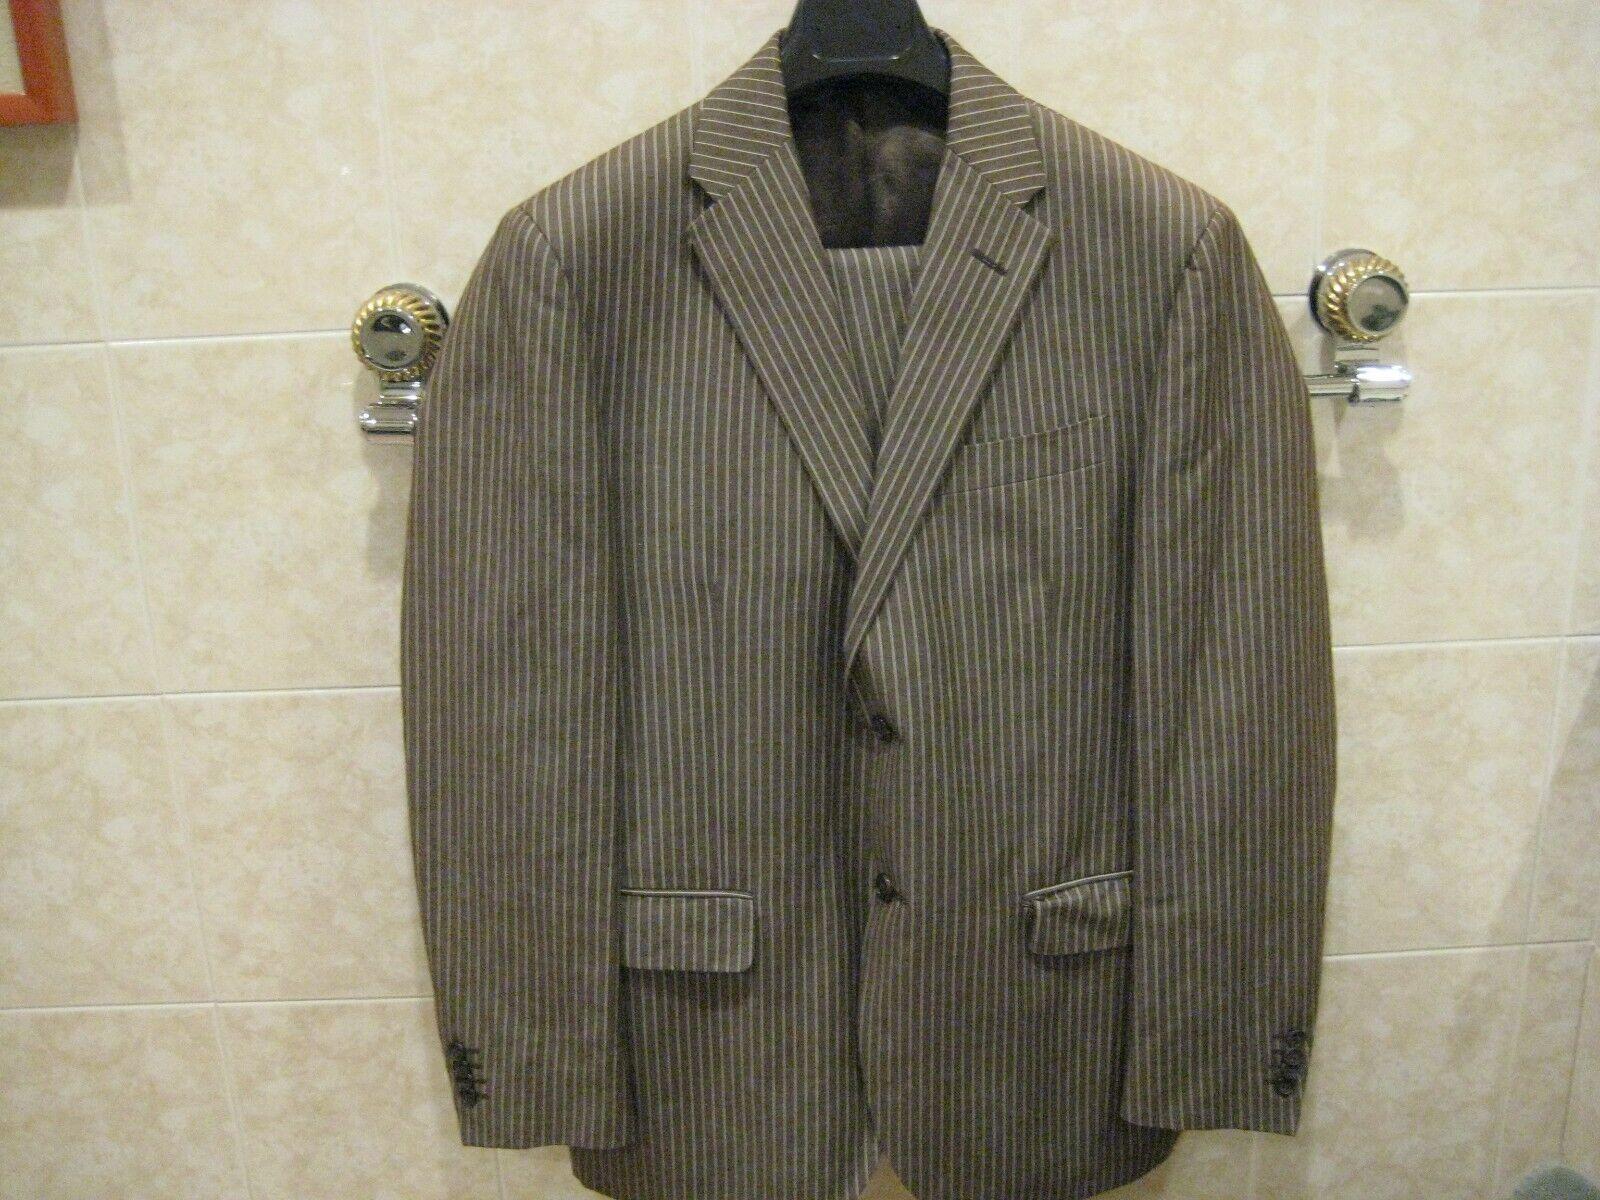 Nino Danieli by Corneliani cotton linen brown pinstriped suit size 50R USA 40